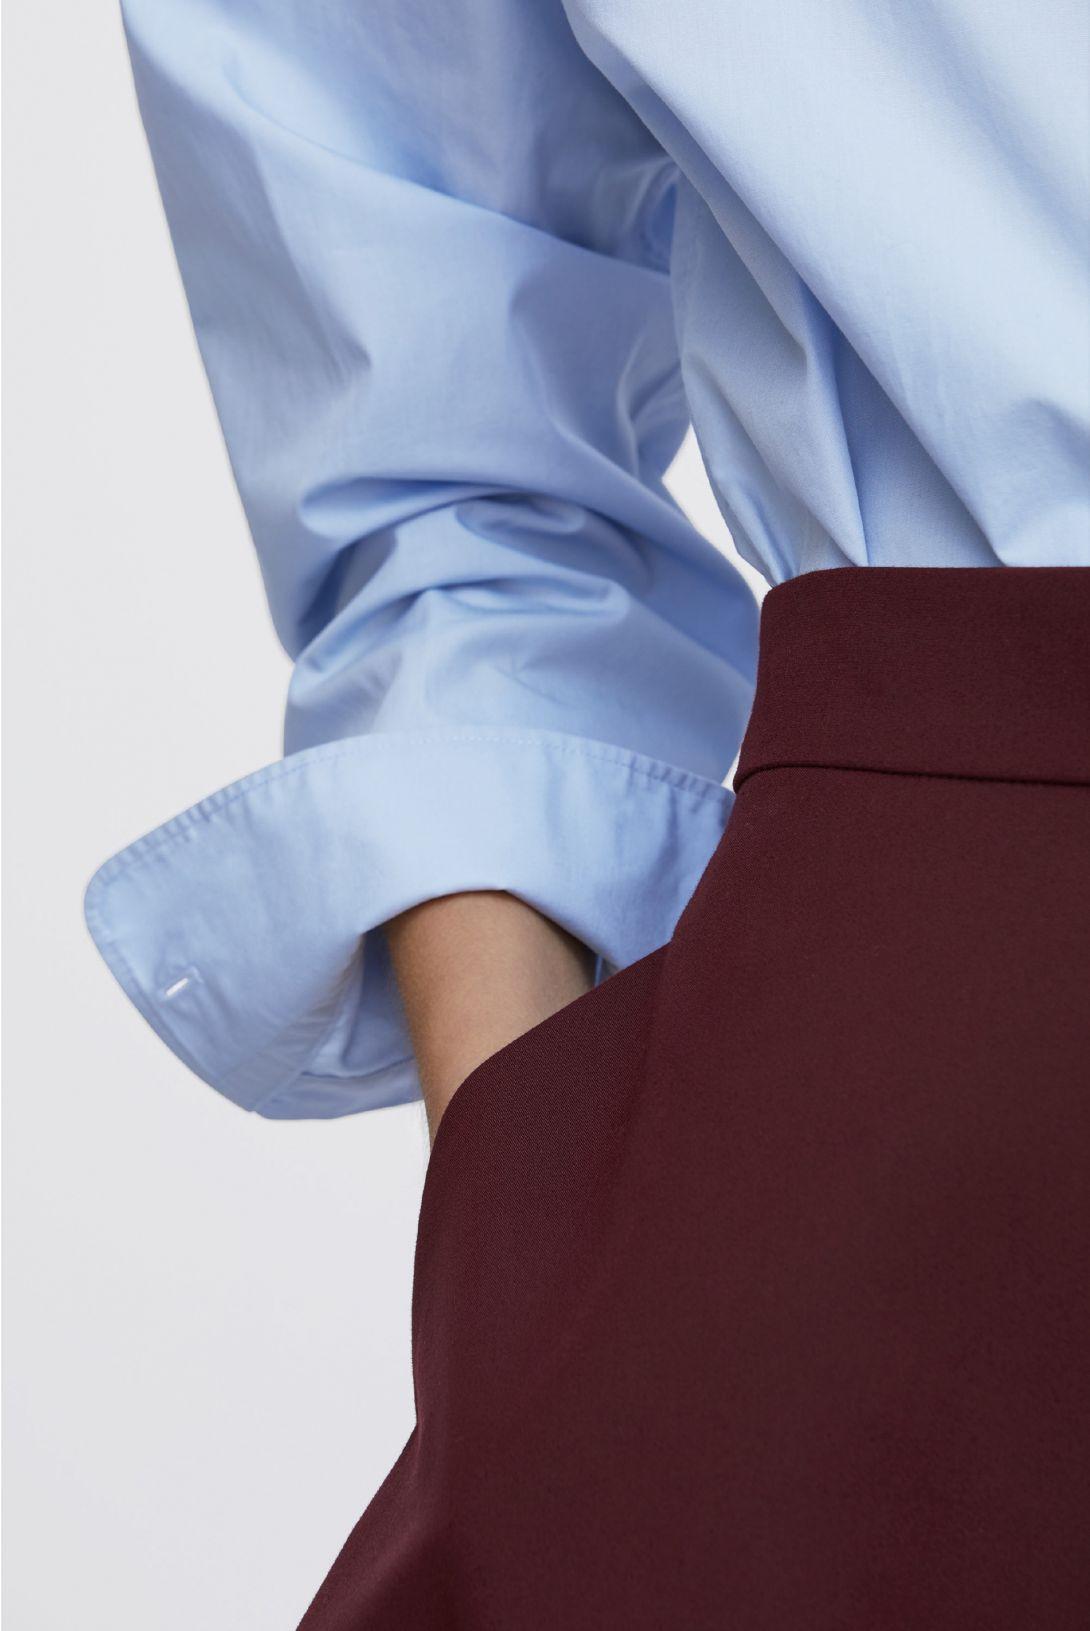 Arket H&M: Burgundy and blue